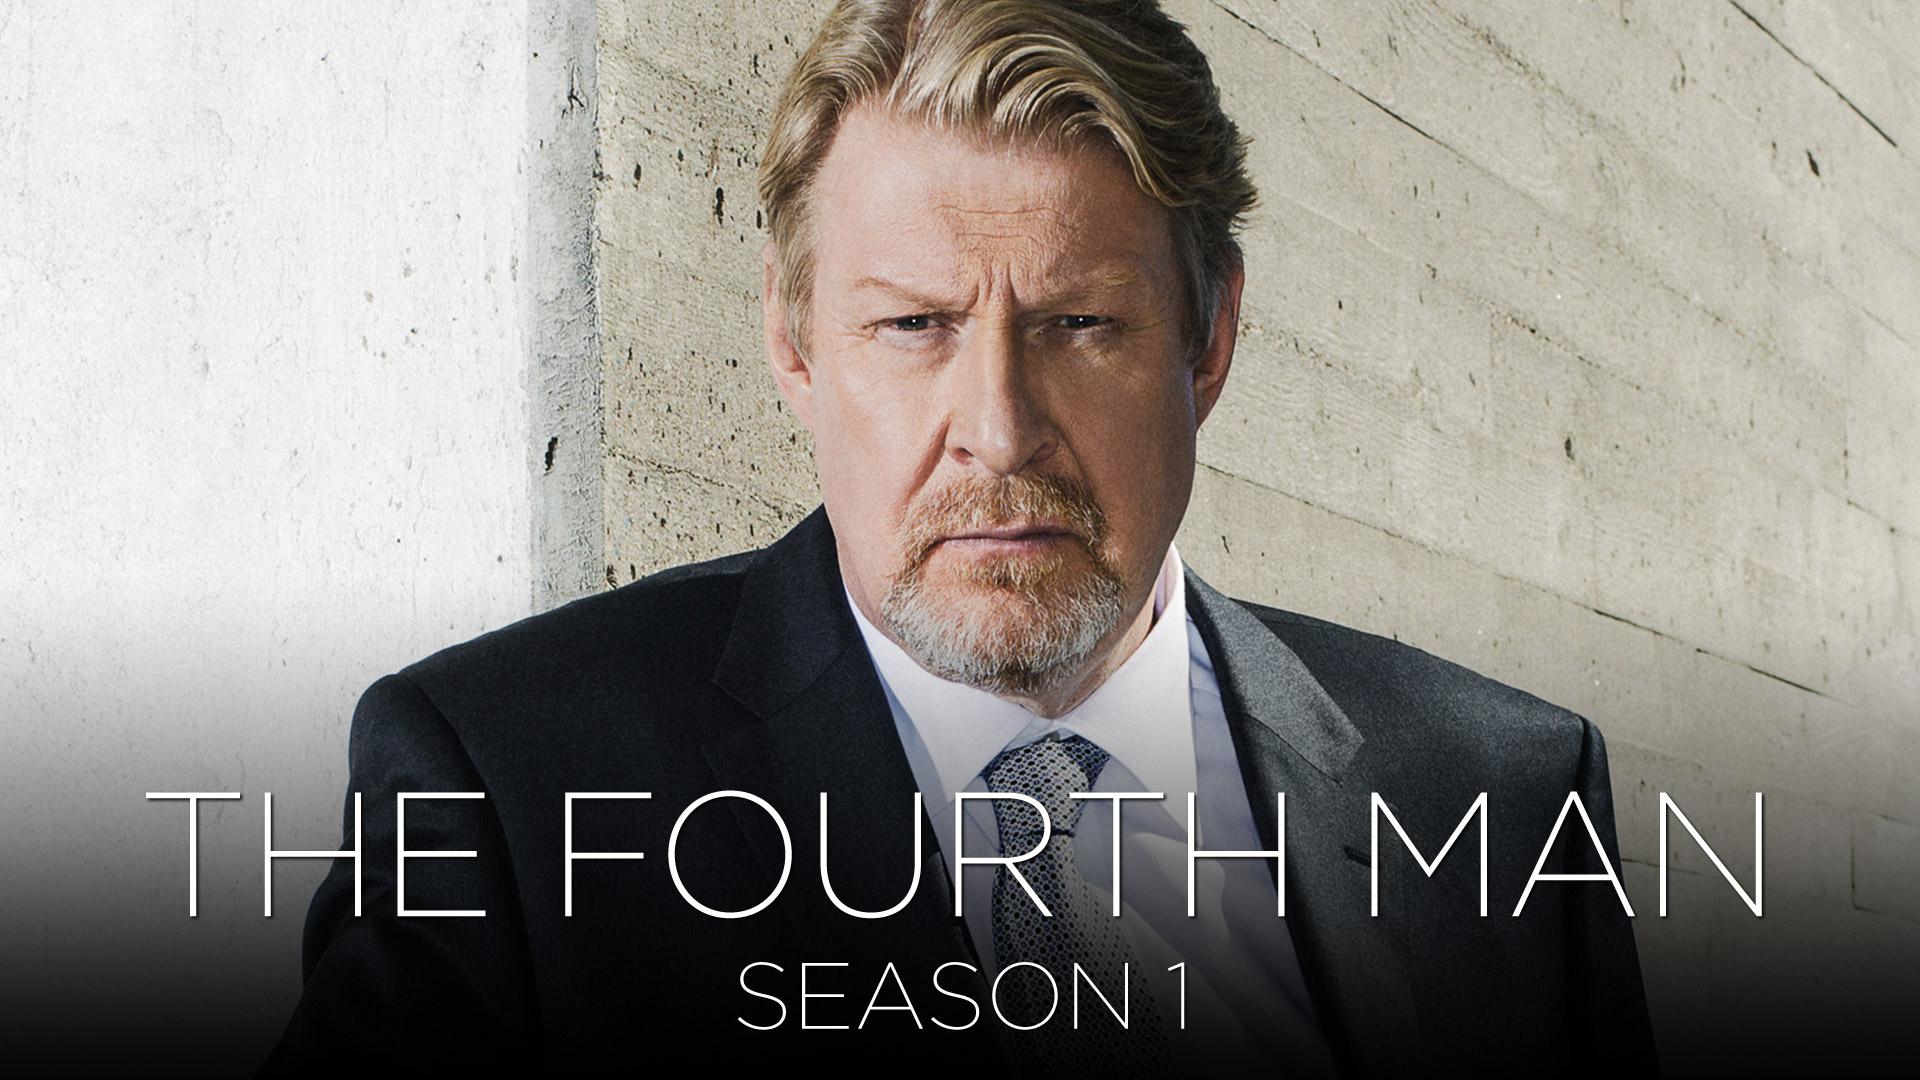 The Fourth Man